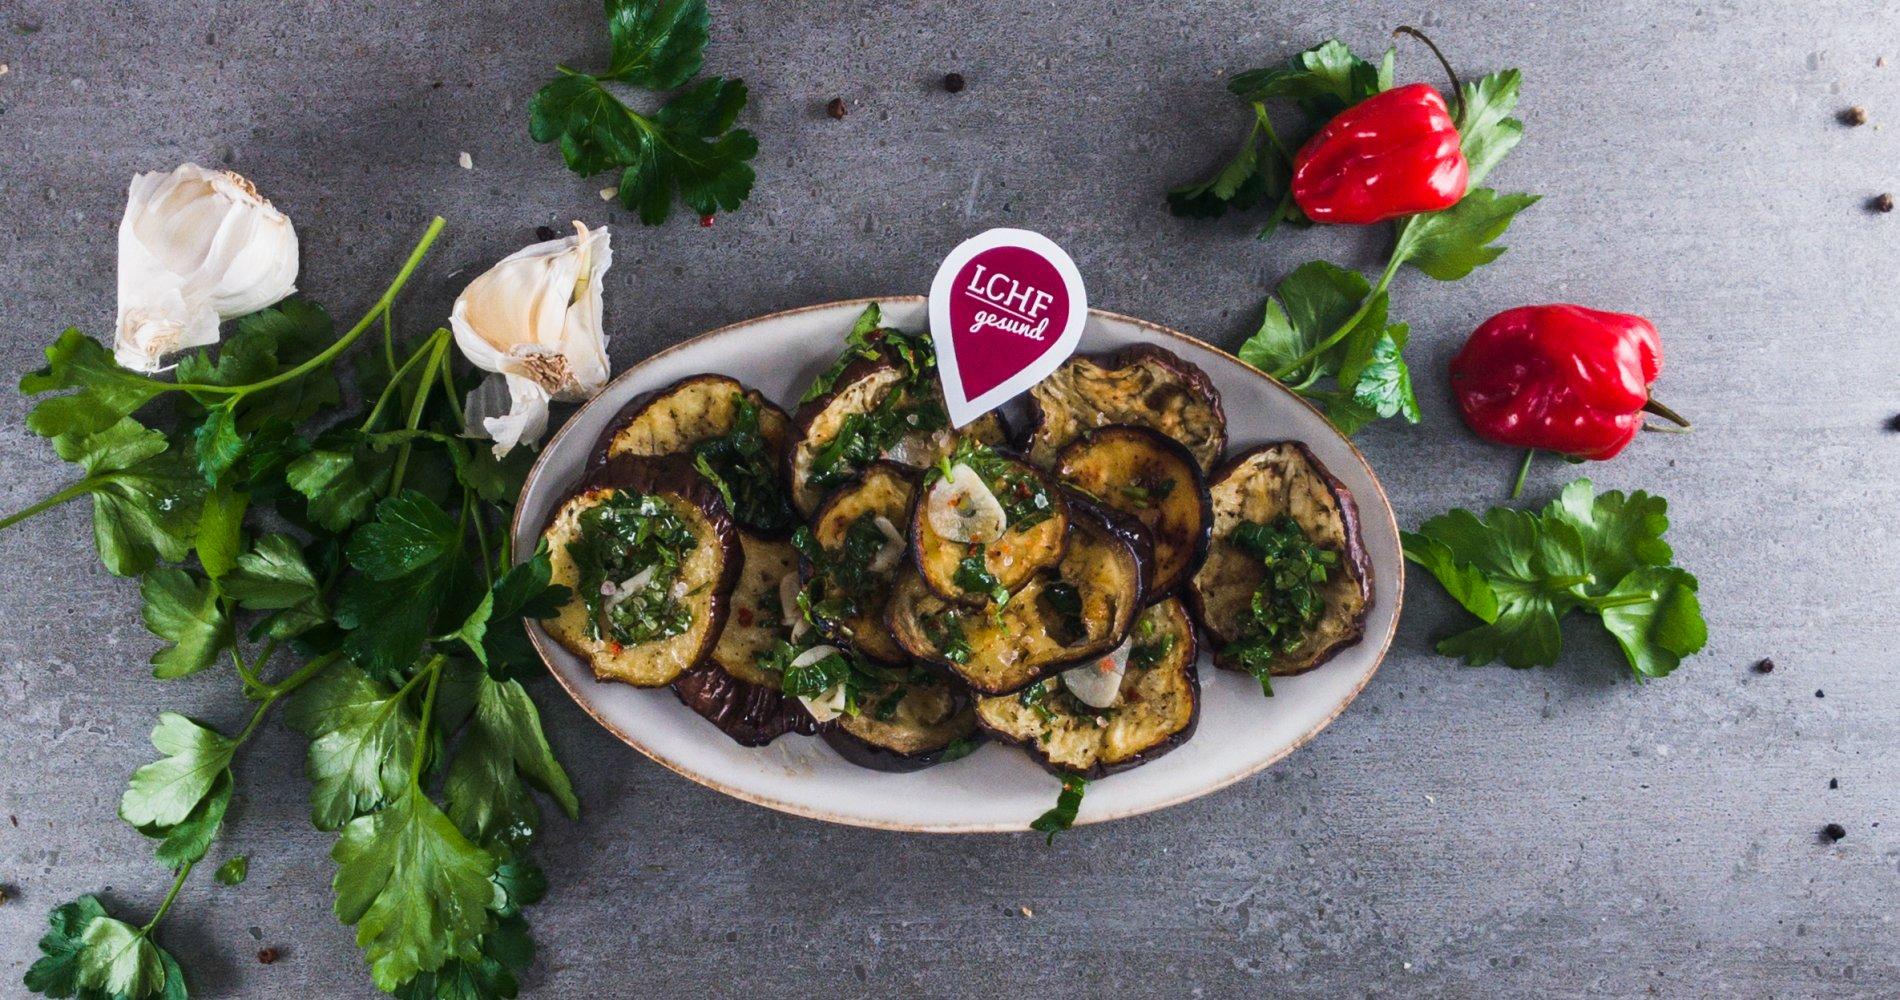 Rezept Low Carb: Auberginen-Petersiliengemüse aus dem Ofen - LCHF-gesund.de